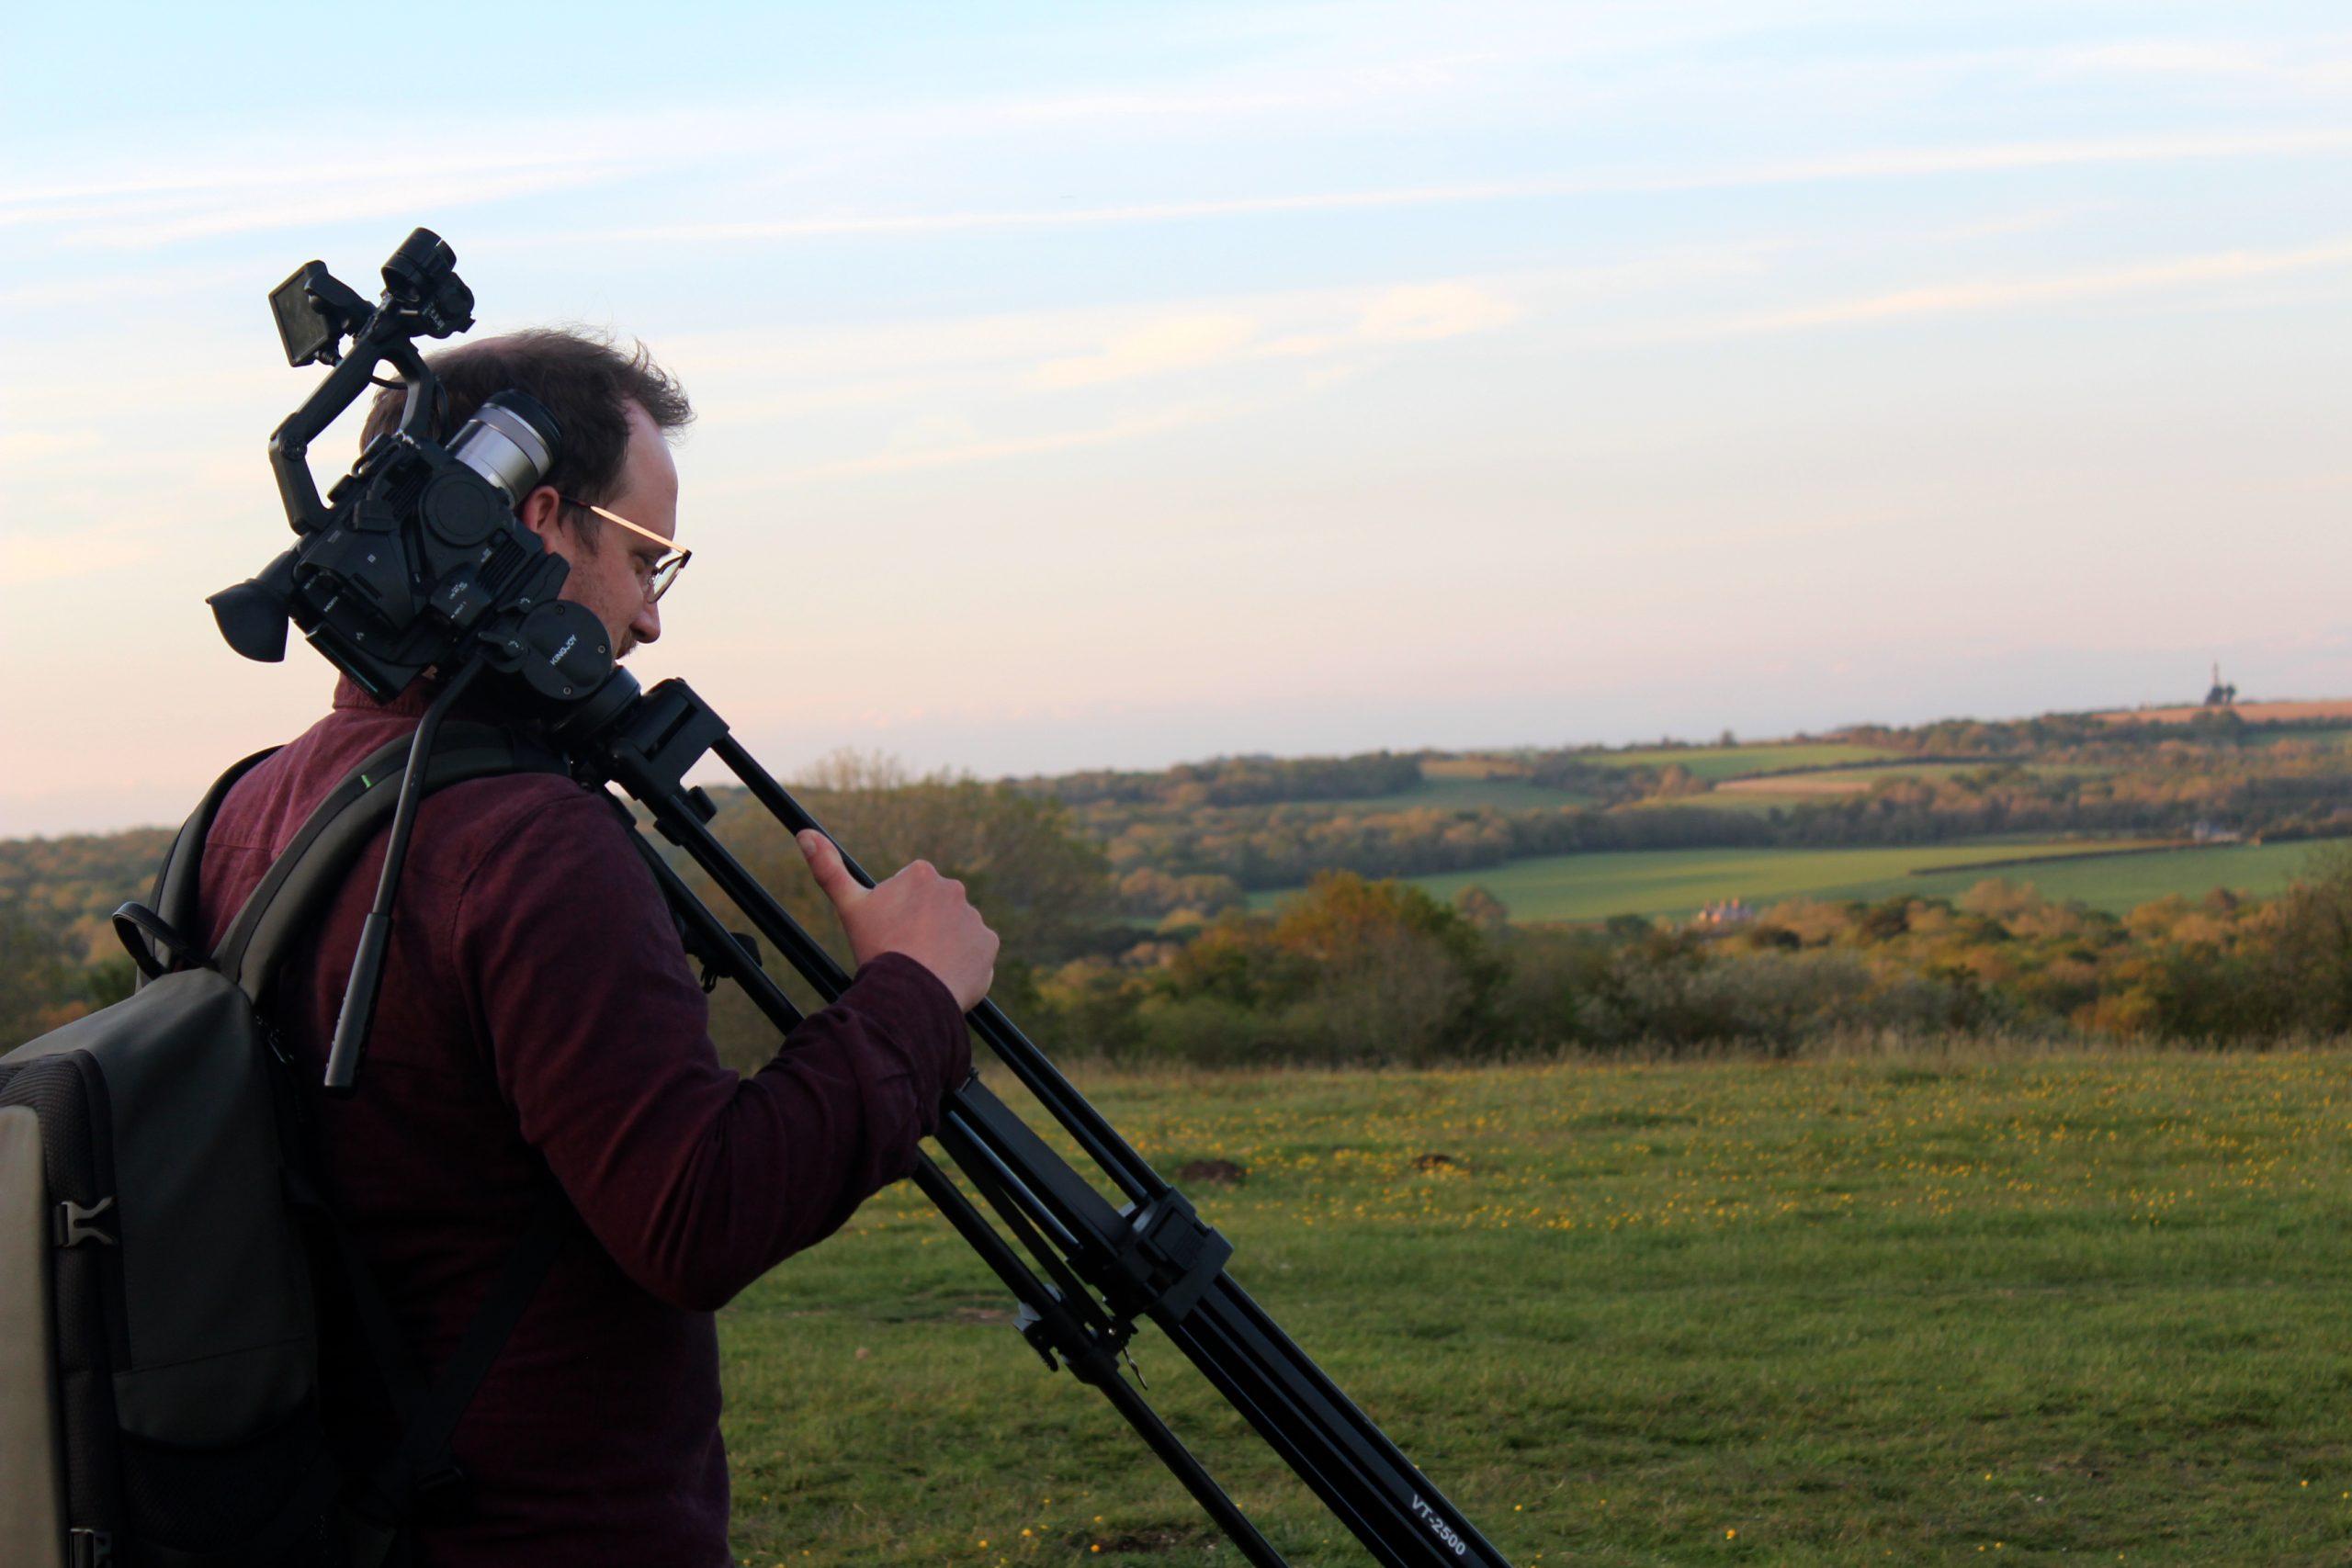 Futurist Media Sussex video production Jon Rist